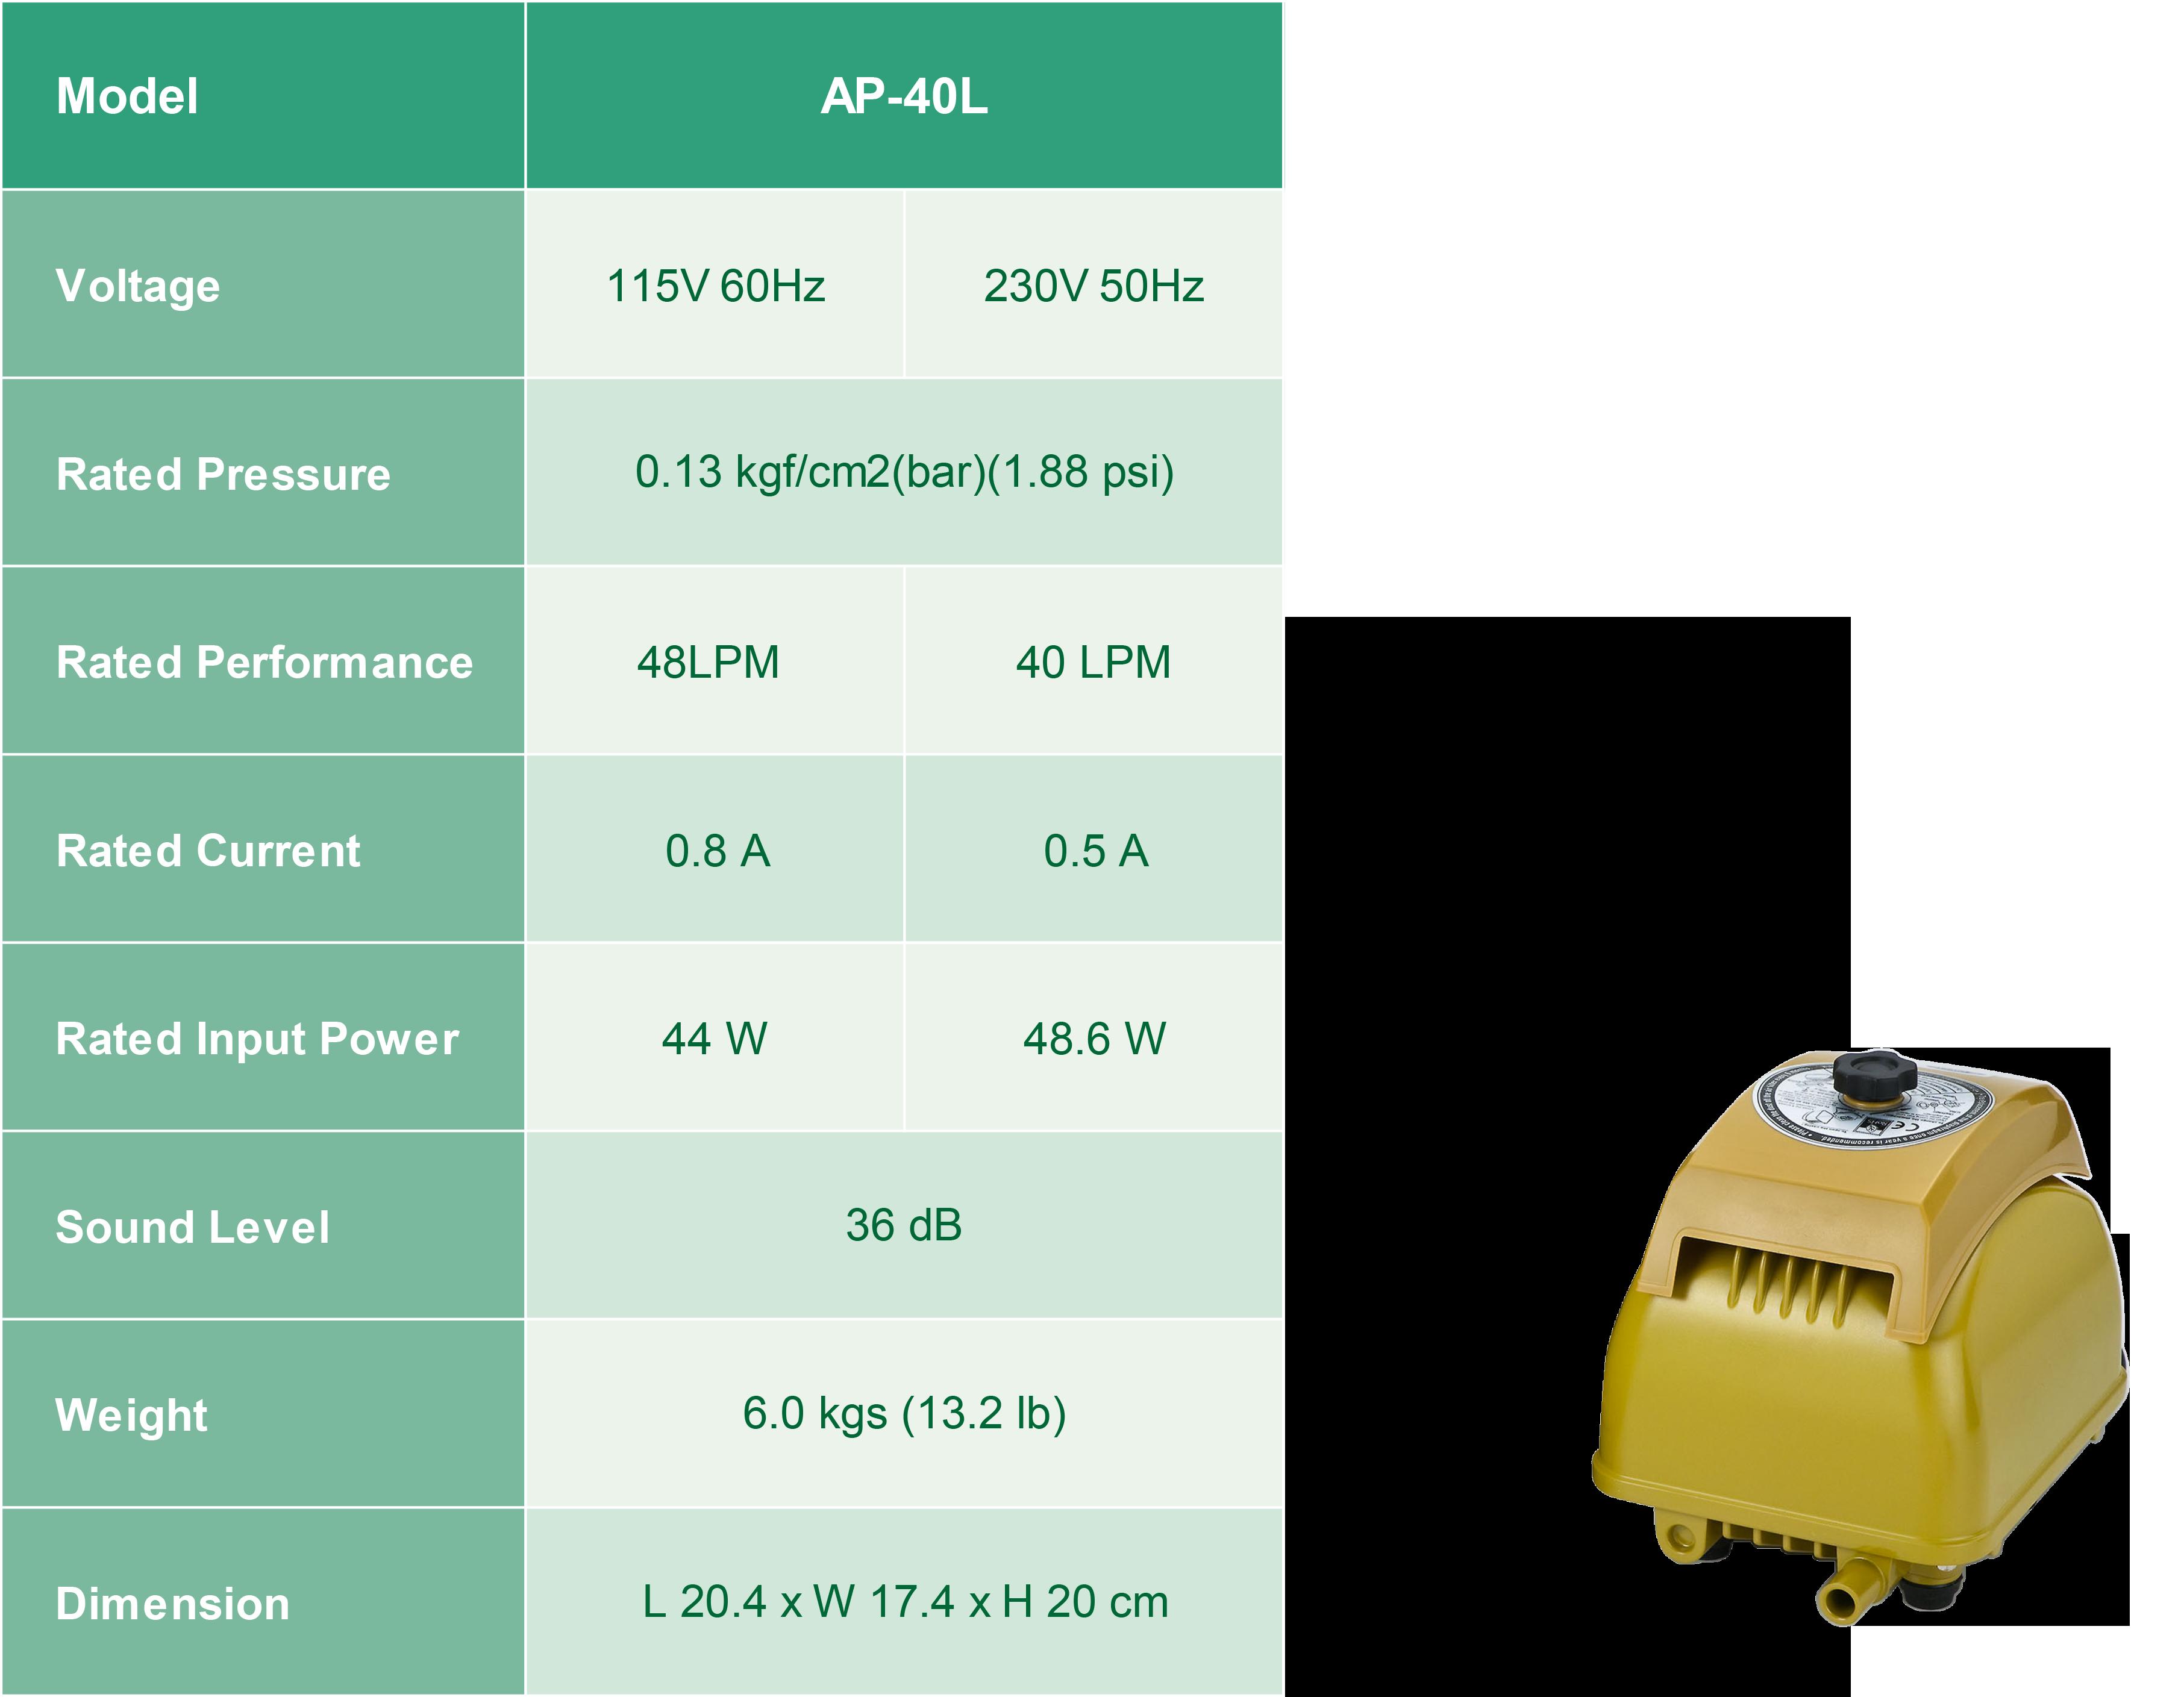 Linear Air Pumps AP-40L Performance